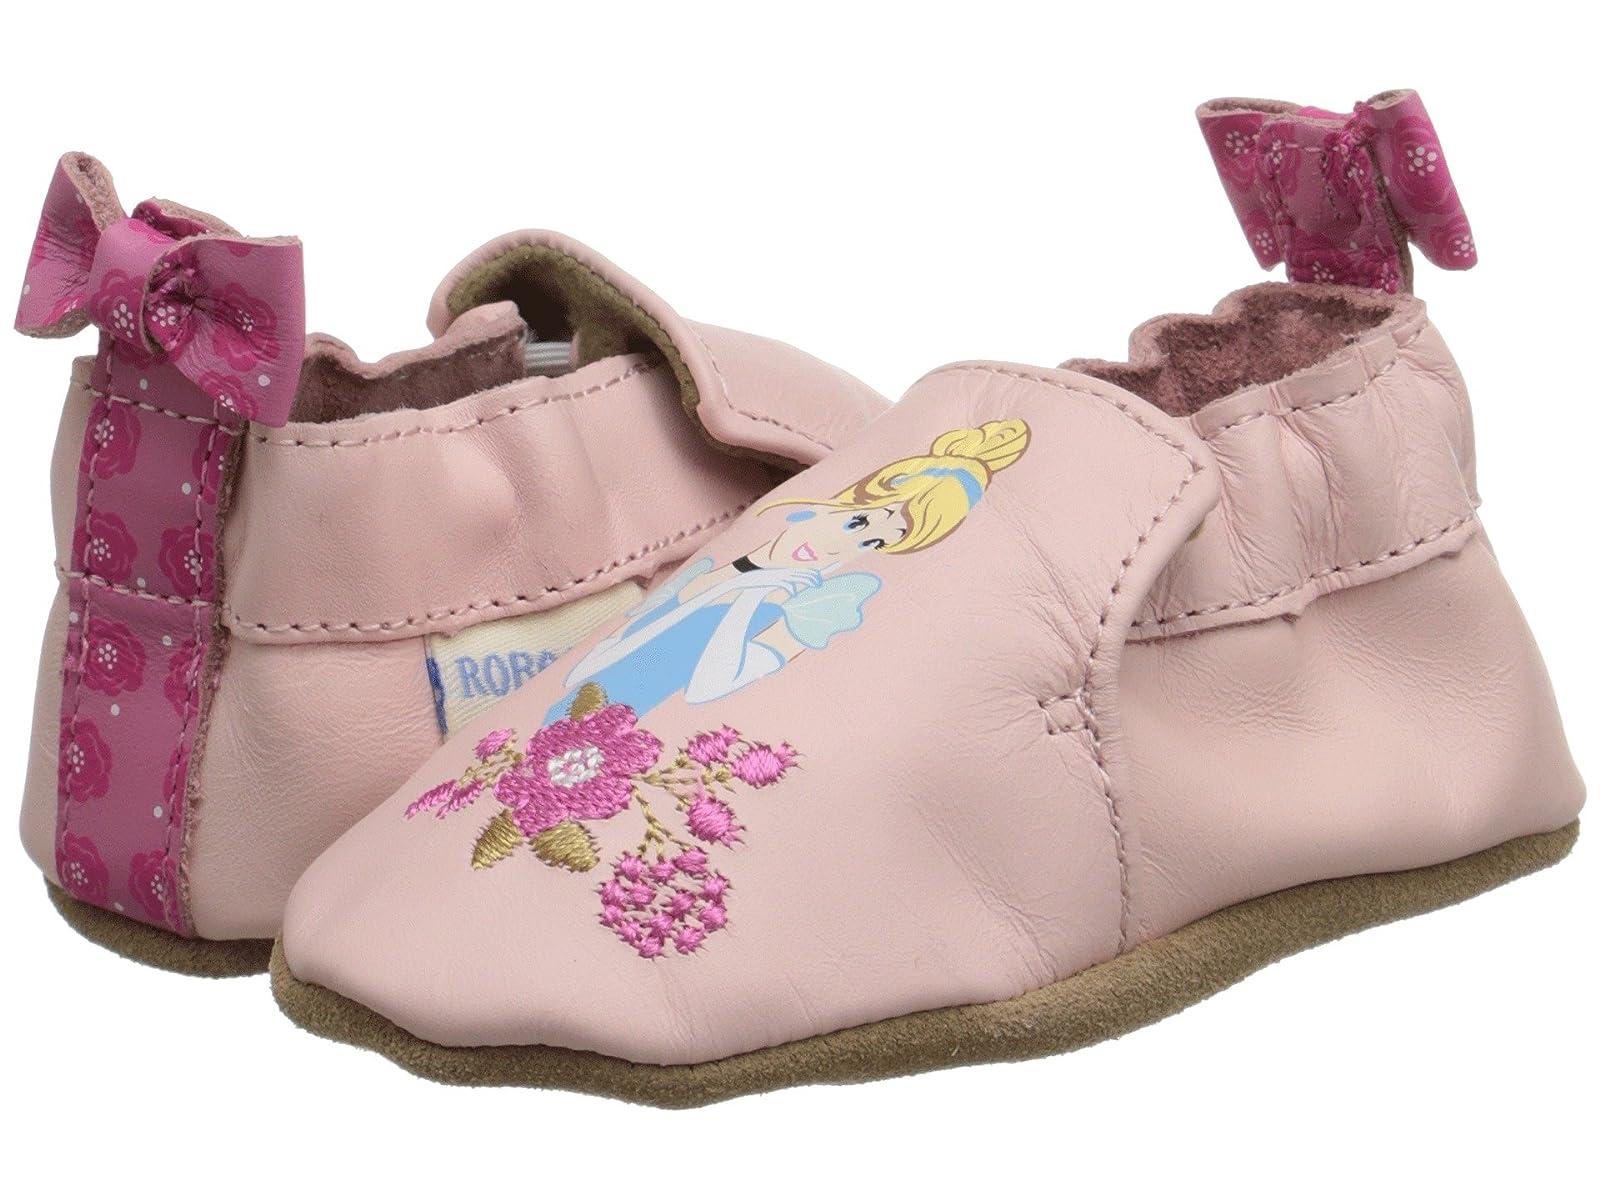 Robeez Disney® Baby By Robeez Cinderella Soft Sole (Infant/Toddler)Atmospheric grades have affordable shoes